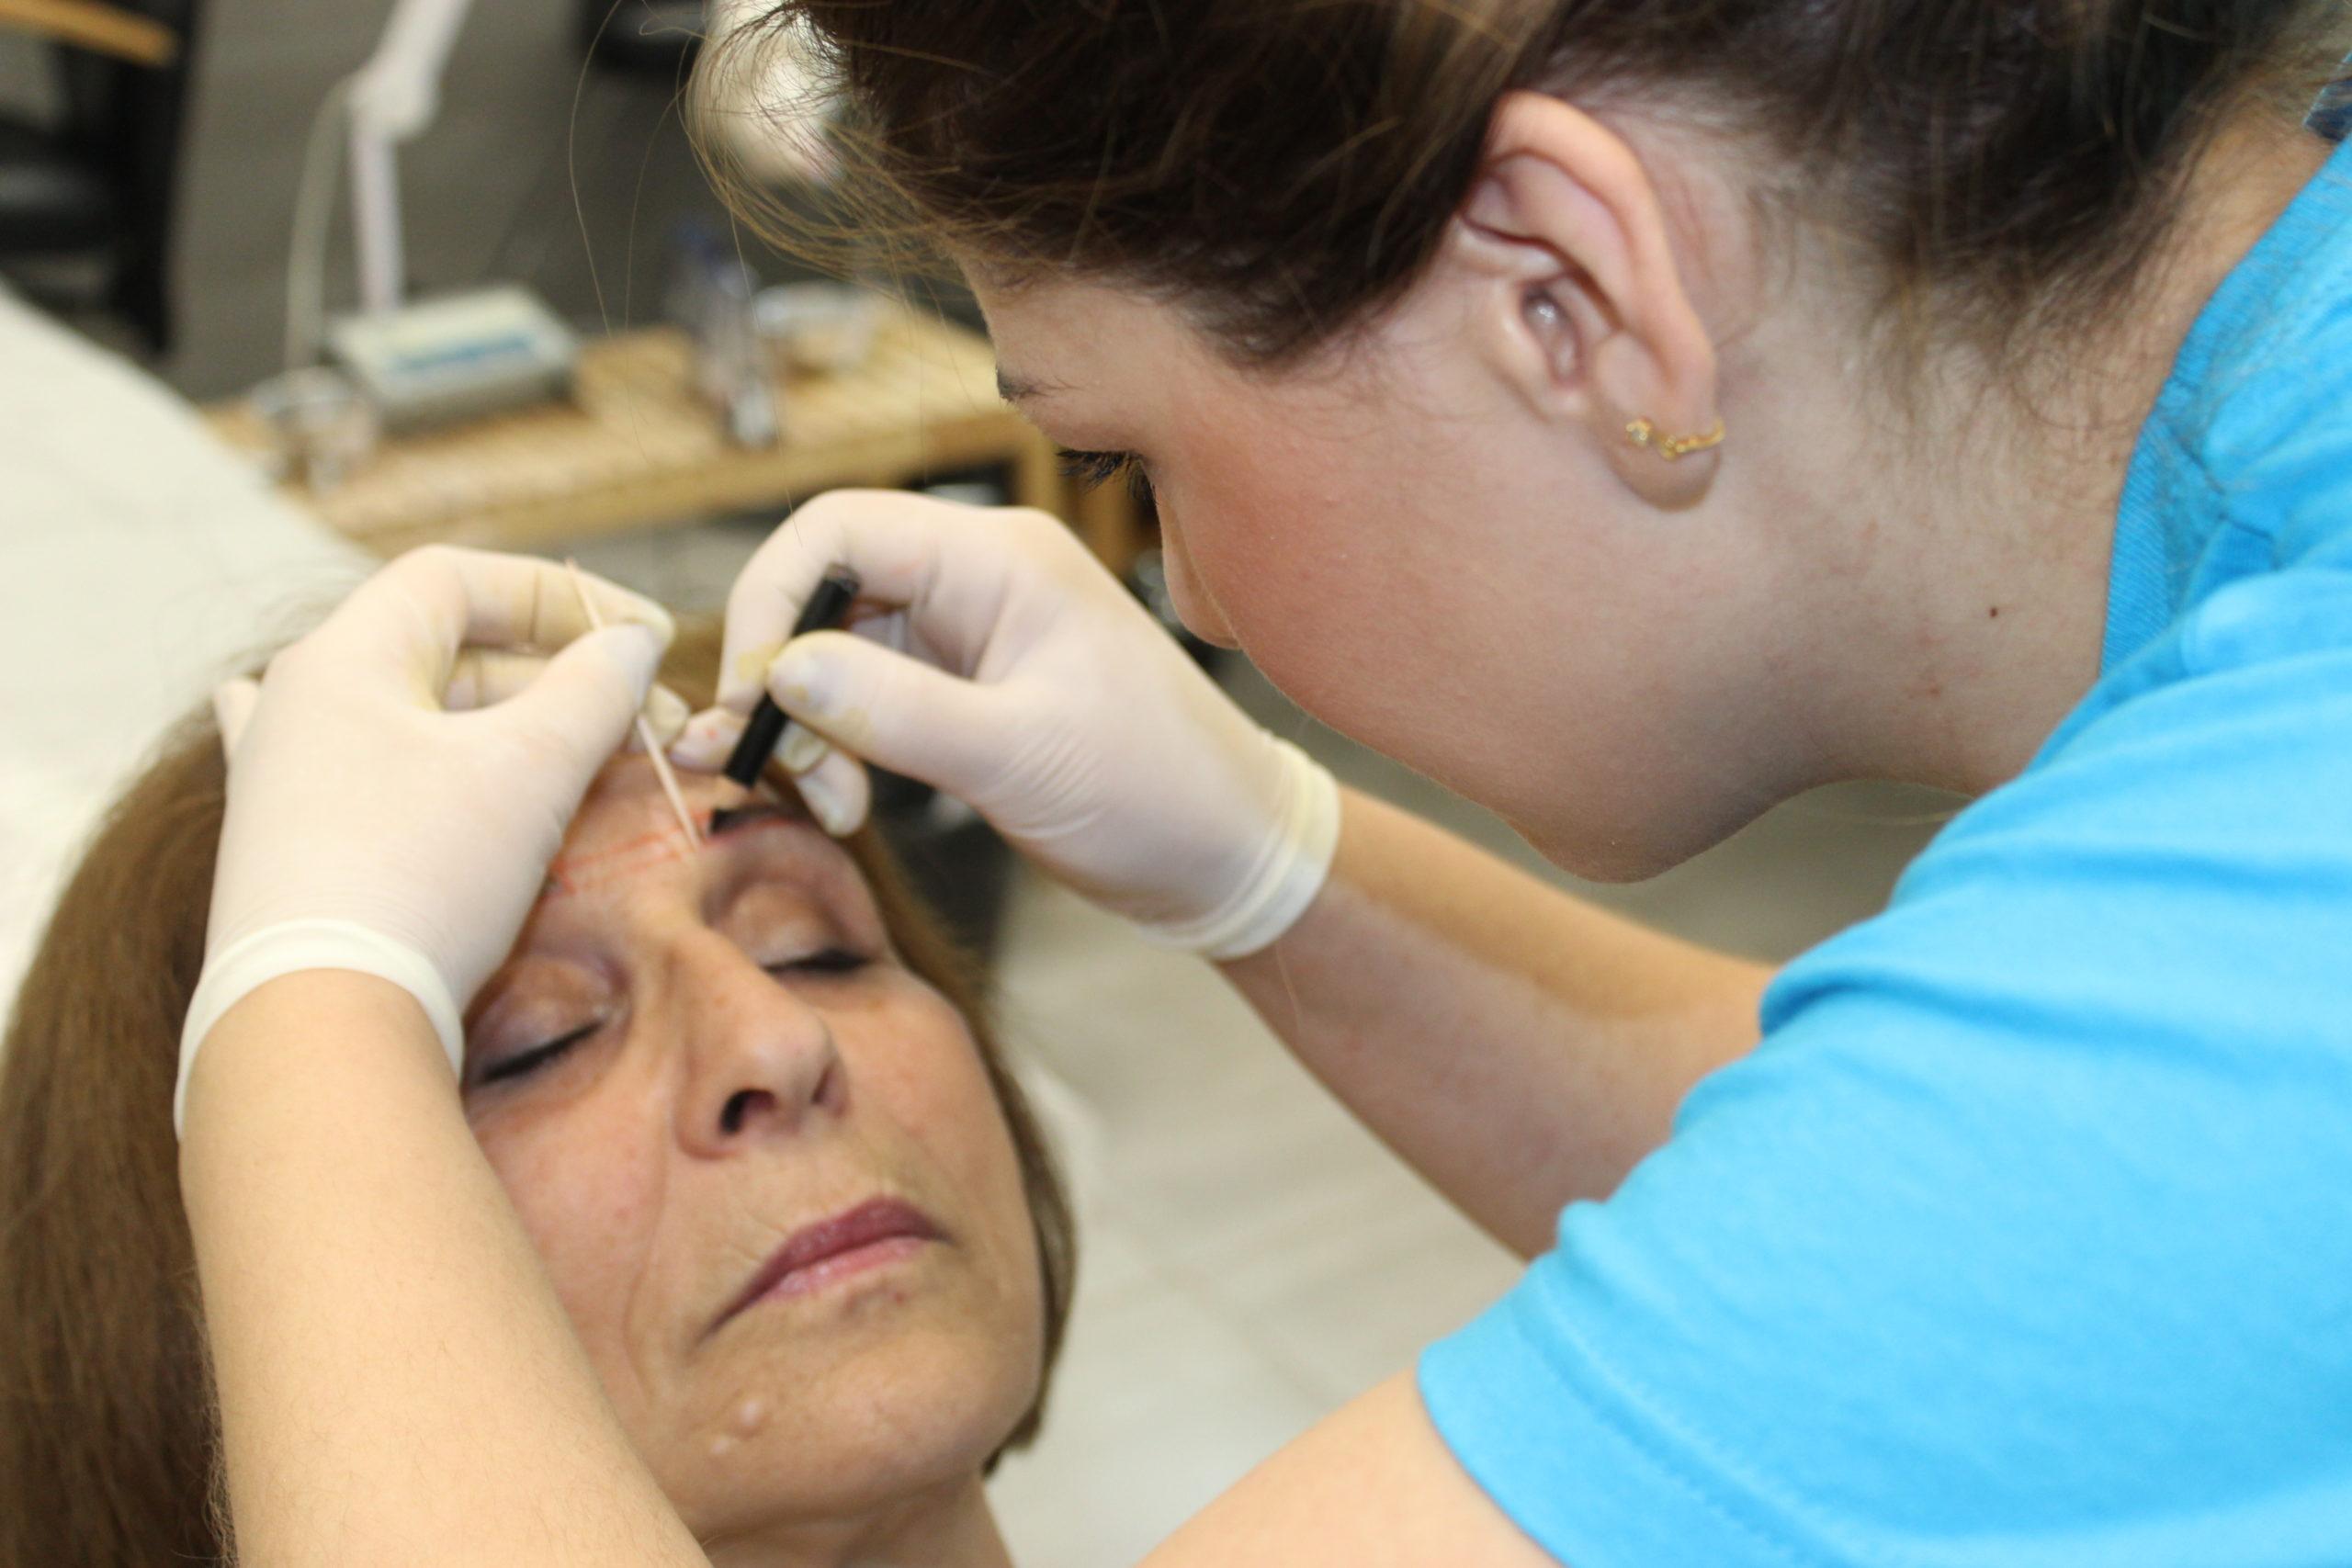 Tecnico En Micropigmentacion Y Tatuaje